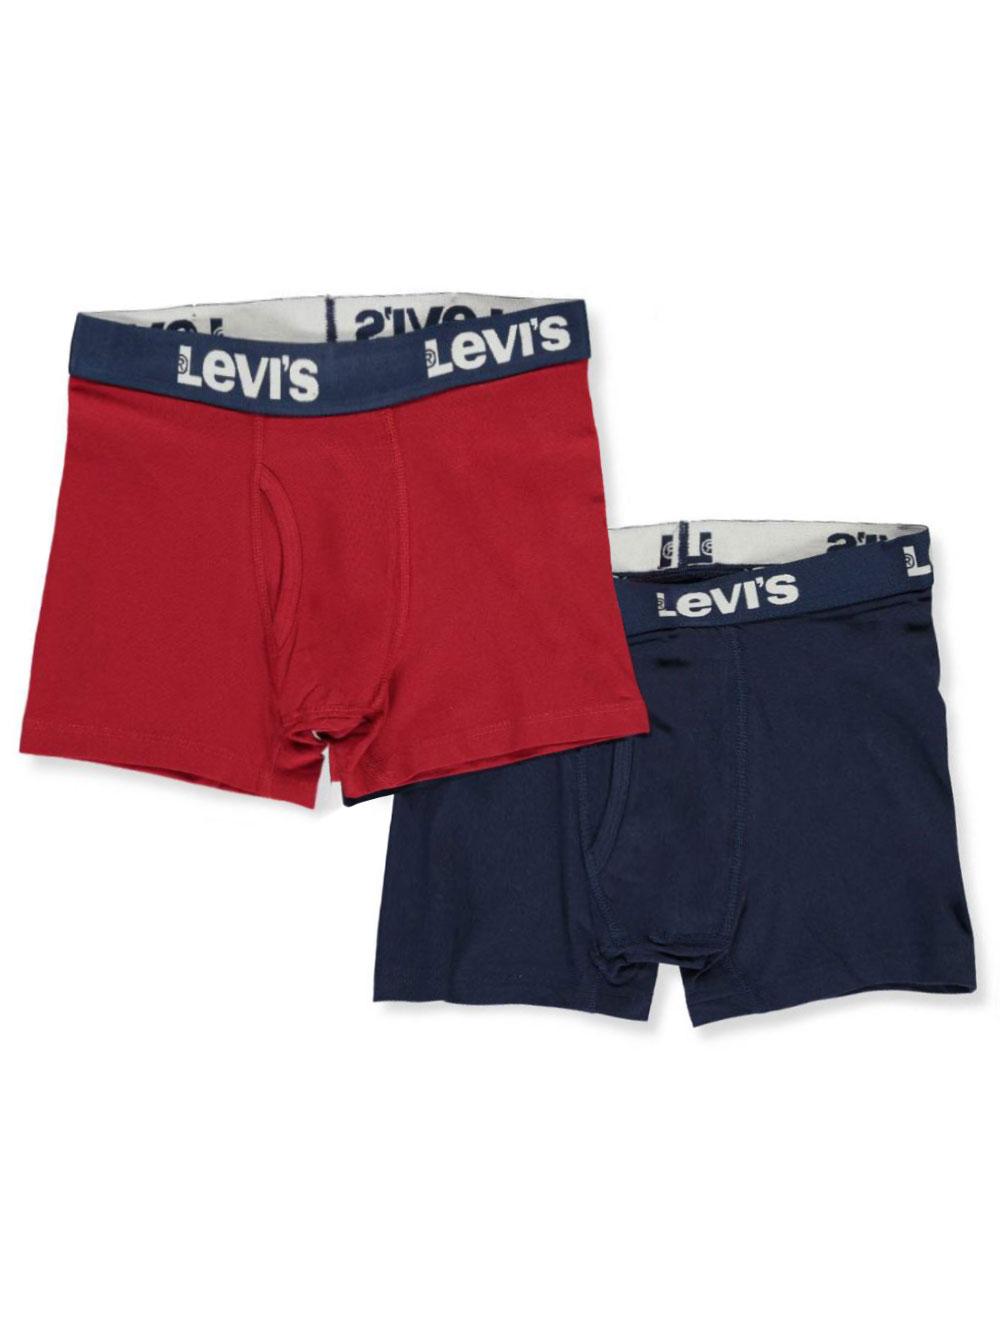 Kids Boxer Shorts Elastic Band Rib Classic Sports Boys Underwear Children Brief